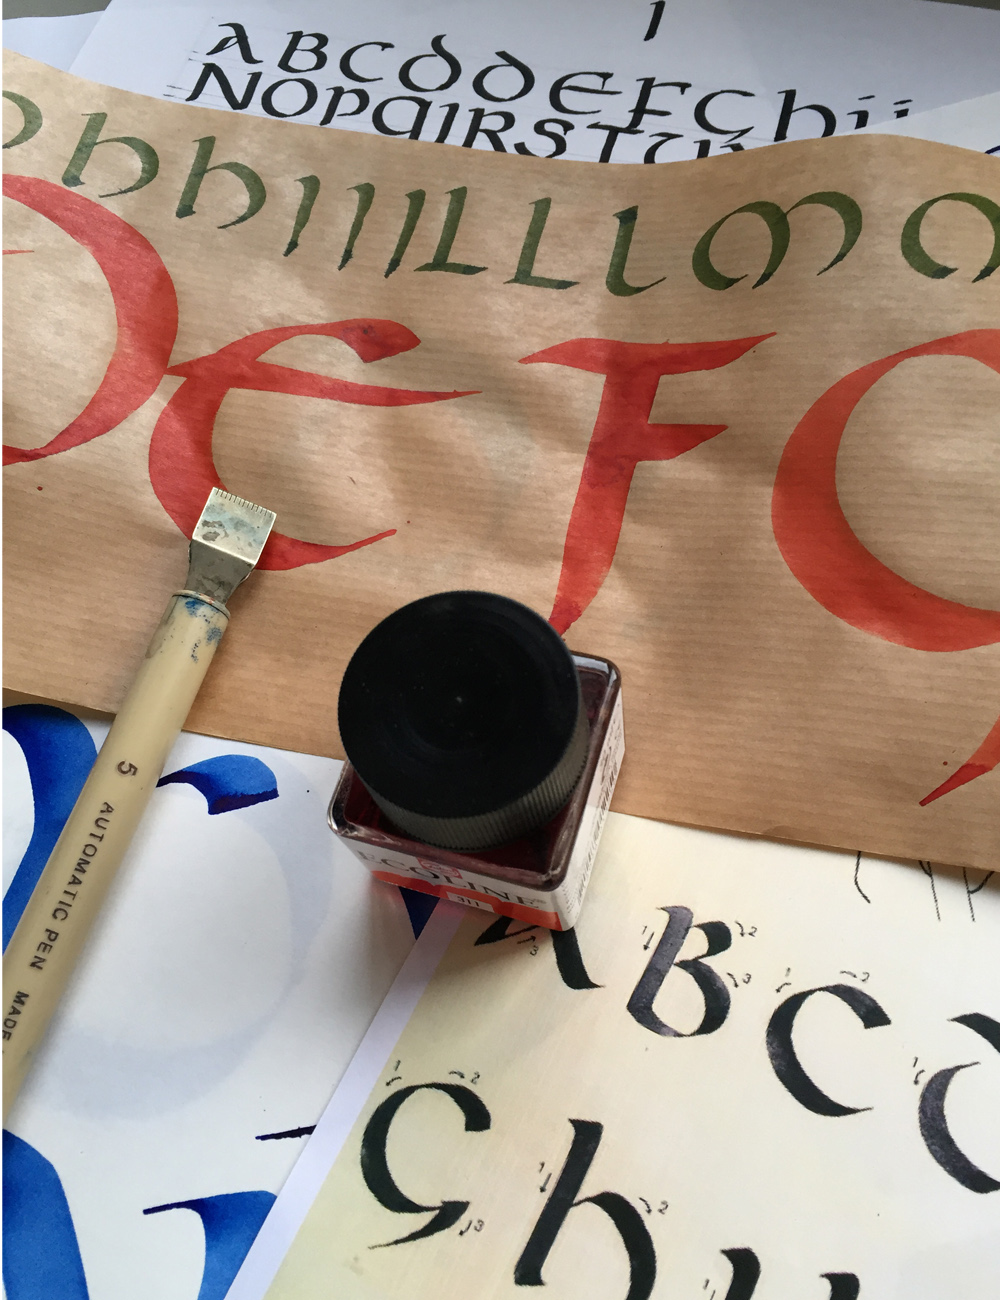 Clases de Caligrafía en la Escuela Deletras - Goyo Valmorisco, Calígrafo profesional. Profesor de caligrafía. Diseño caligráfico.